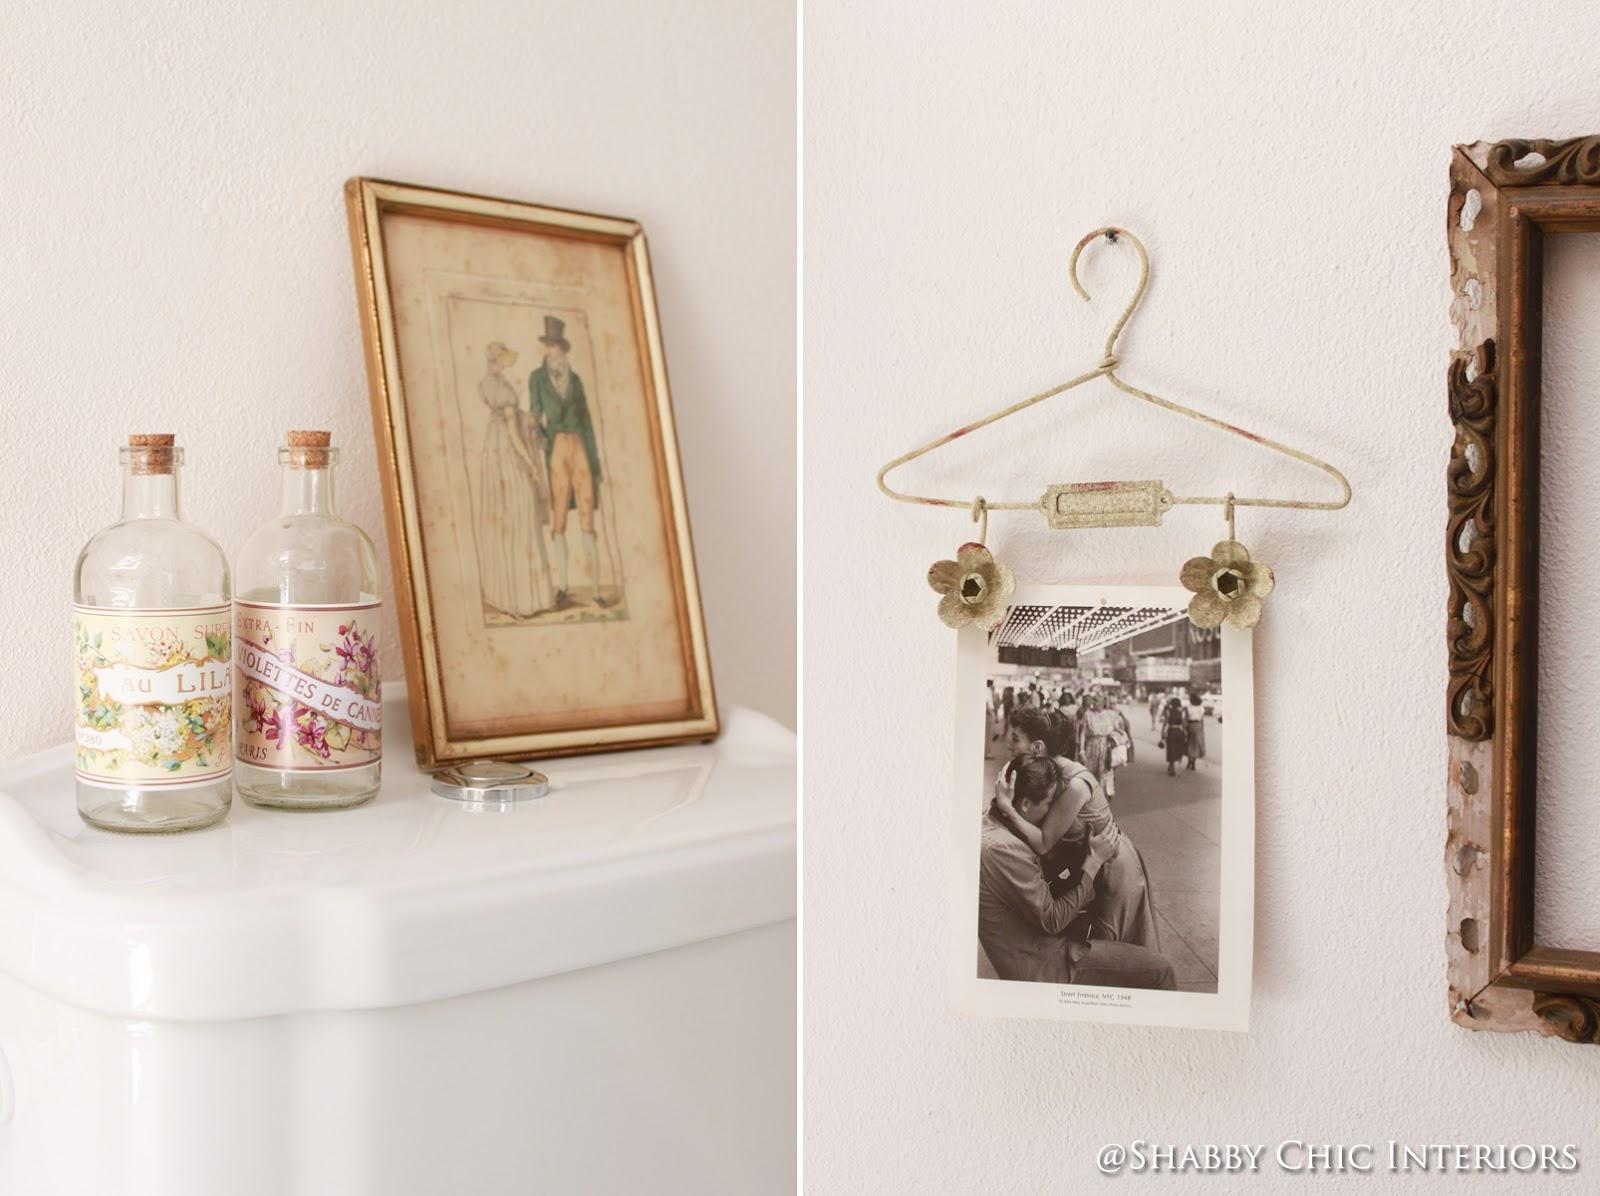 Un bagno in stile shabby shabby chic interiors - Porte stile shabby chic ...